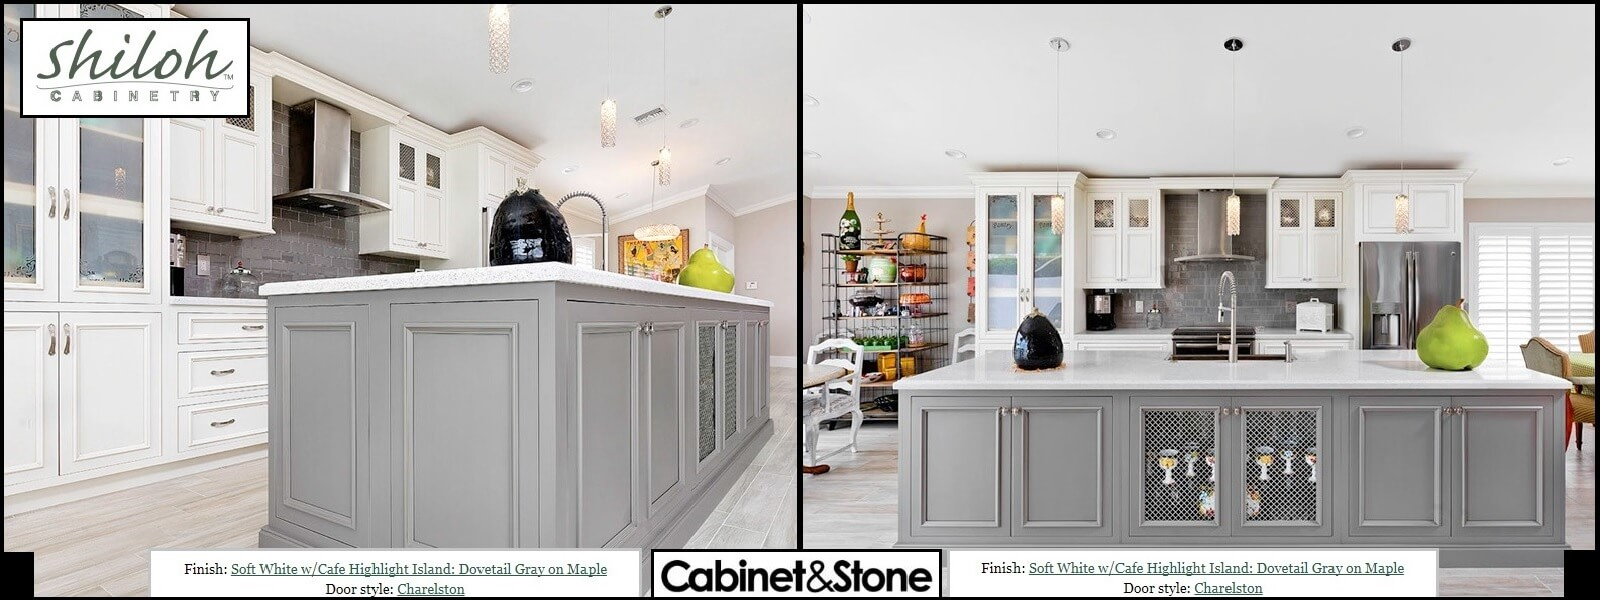 Kitchen Cabinets Countertops Remodeling Contractor Showroom